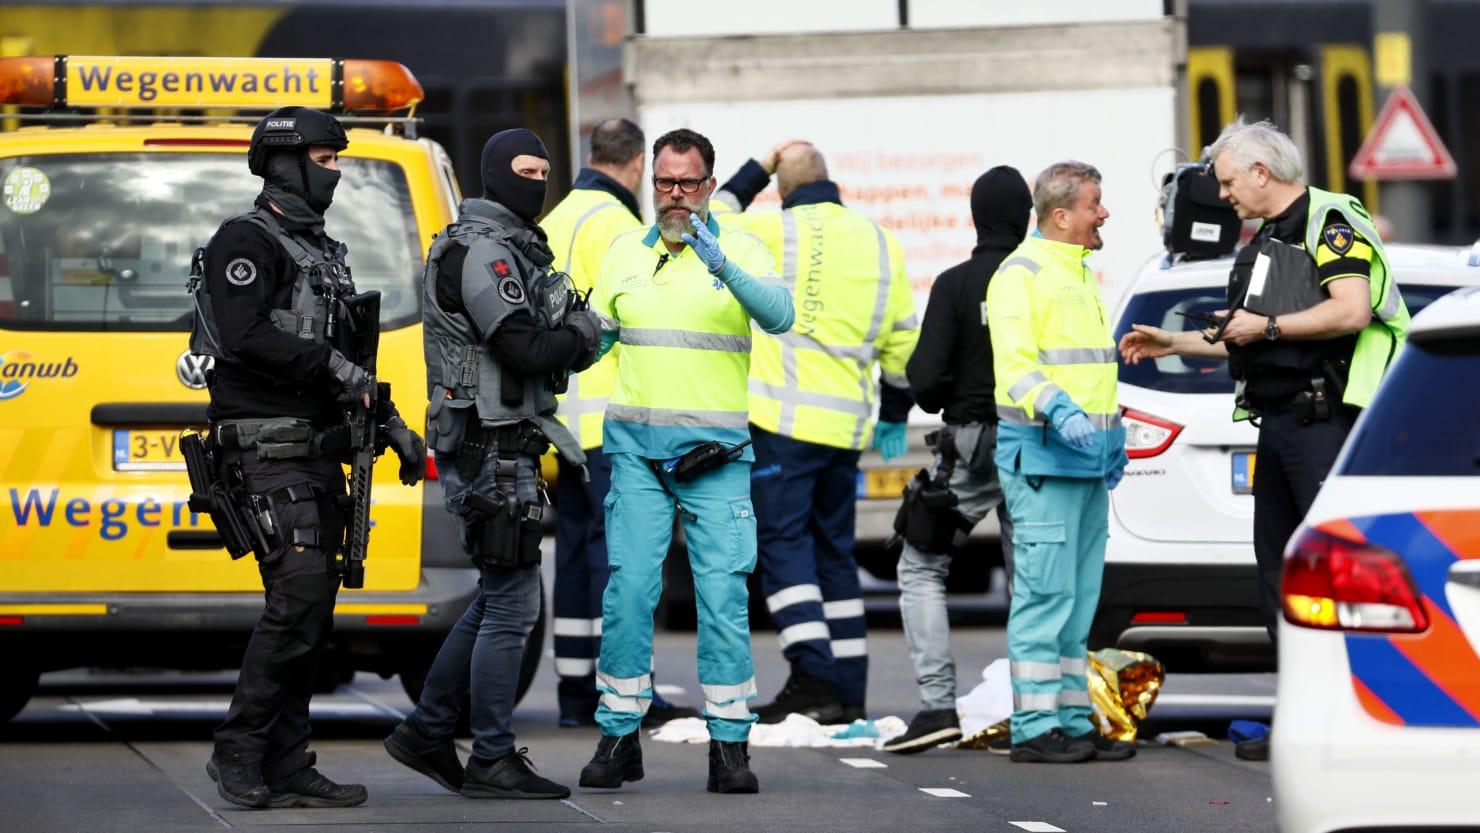 Netherlands Tram Shooting: Manhunt After Gunman Opens Fire on Transit Car